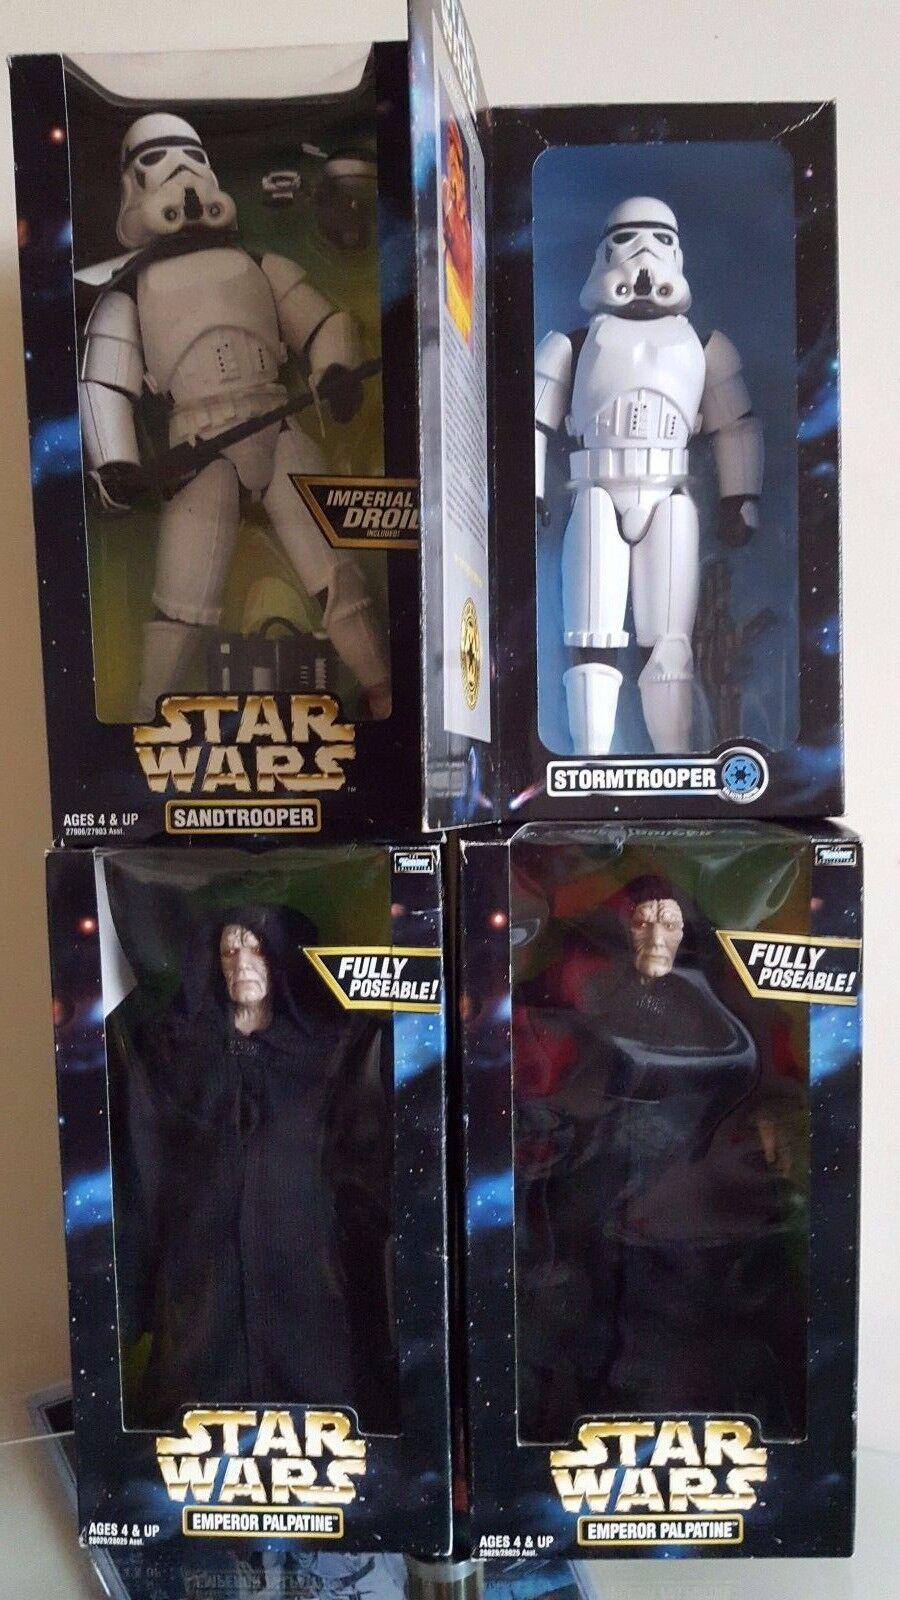 Star Wars Emperor Palpatine Sandtrooper & Stormtrooper  12  Figures  Vintage